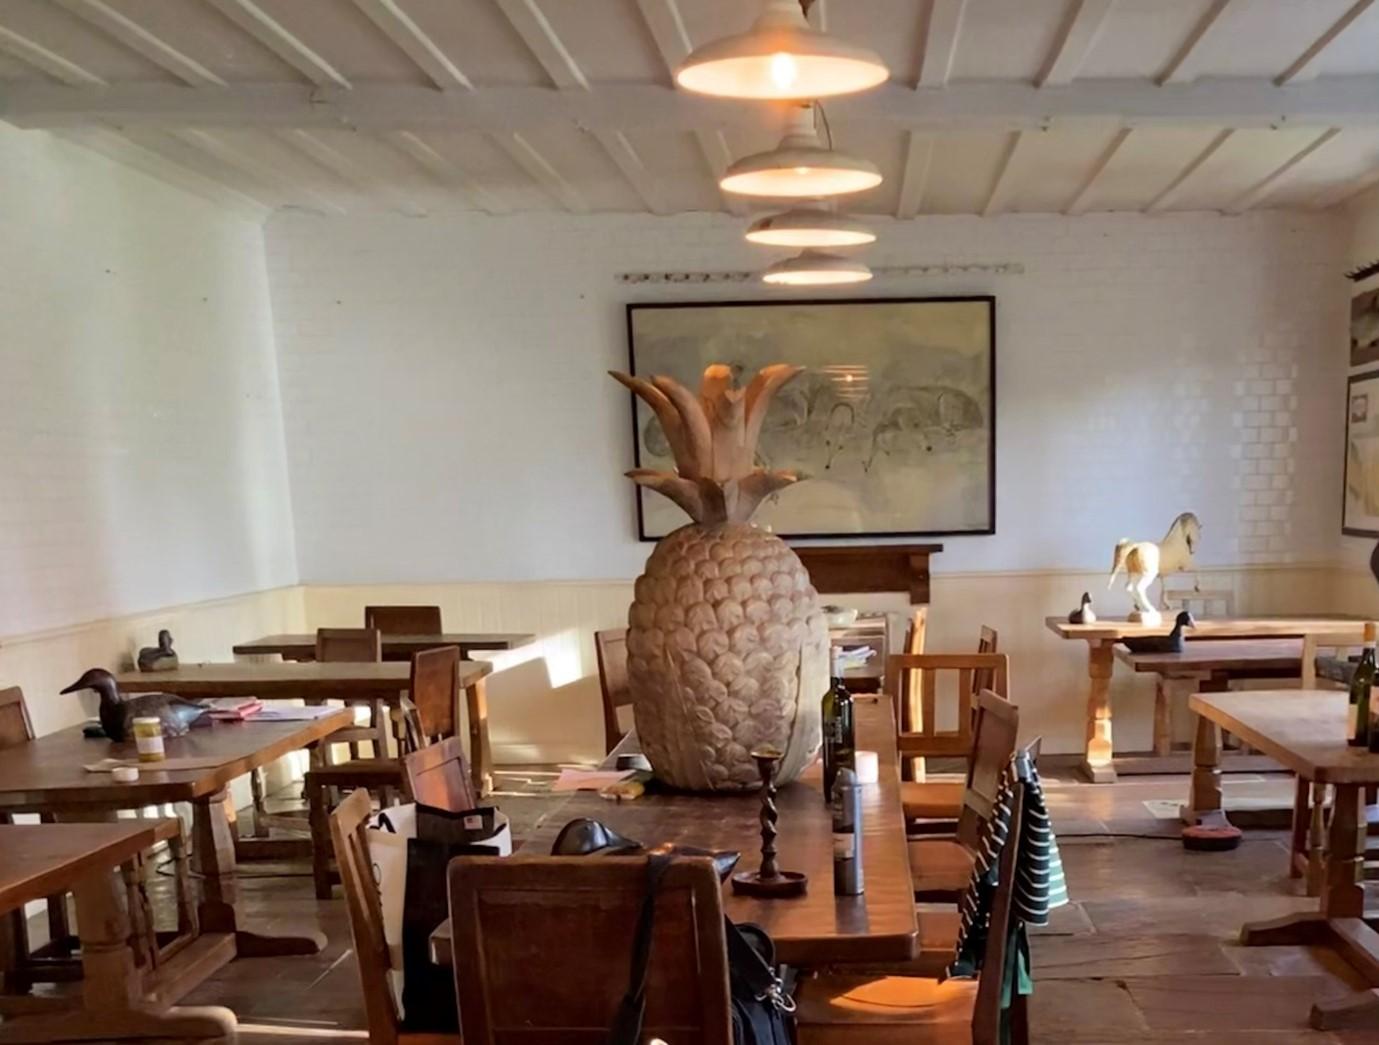 The Rudloe Arm restaurant